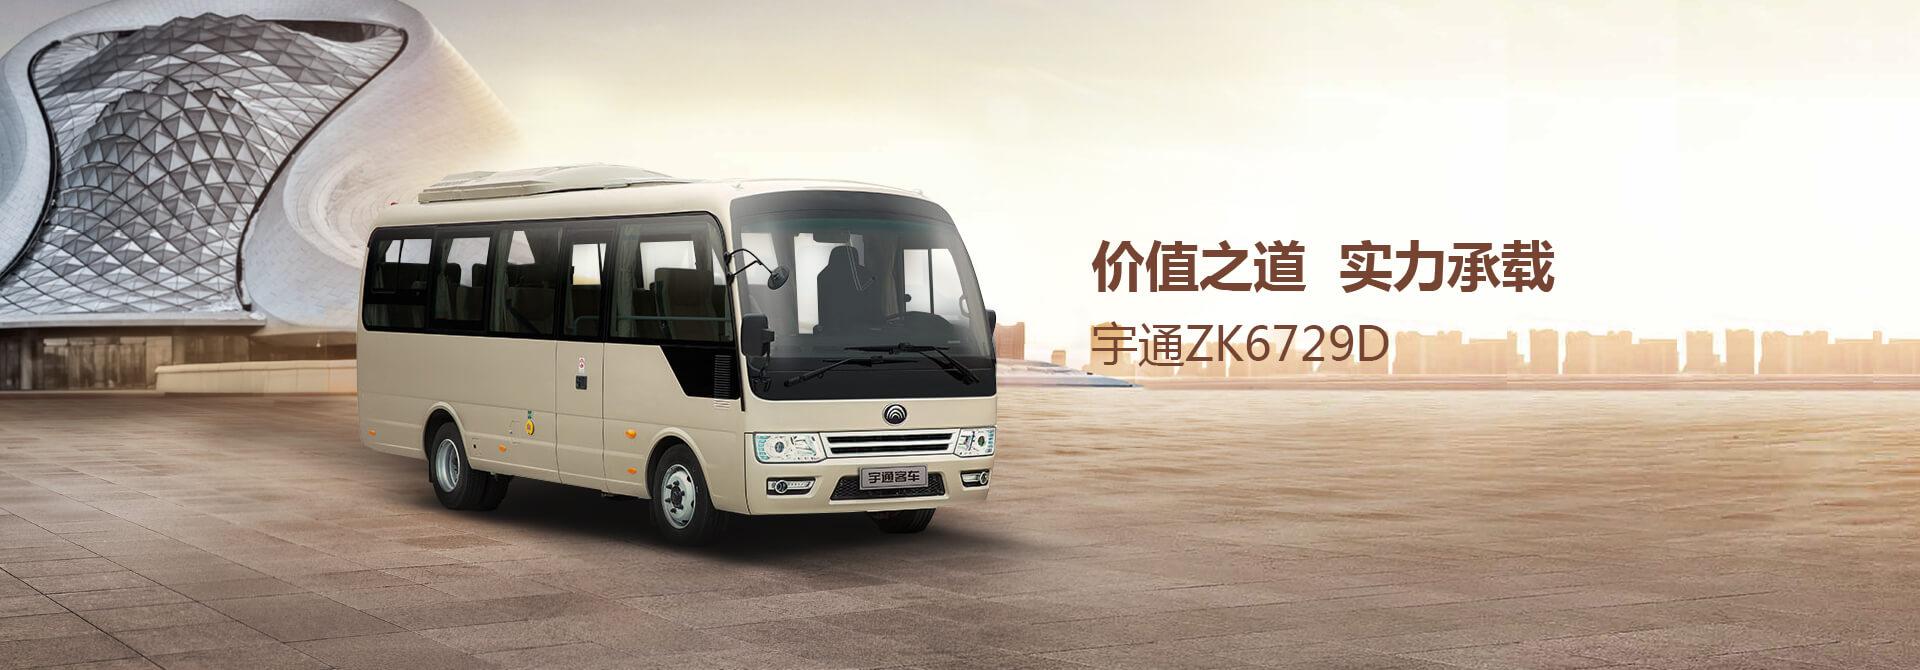 26-ZK6729DT前置国五柴油团体旅游产品